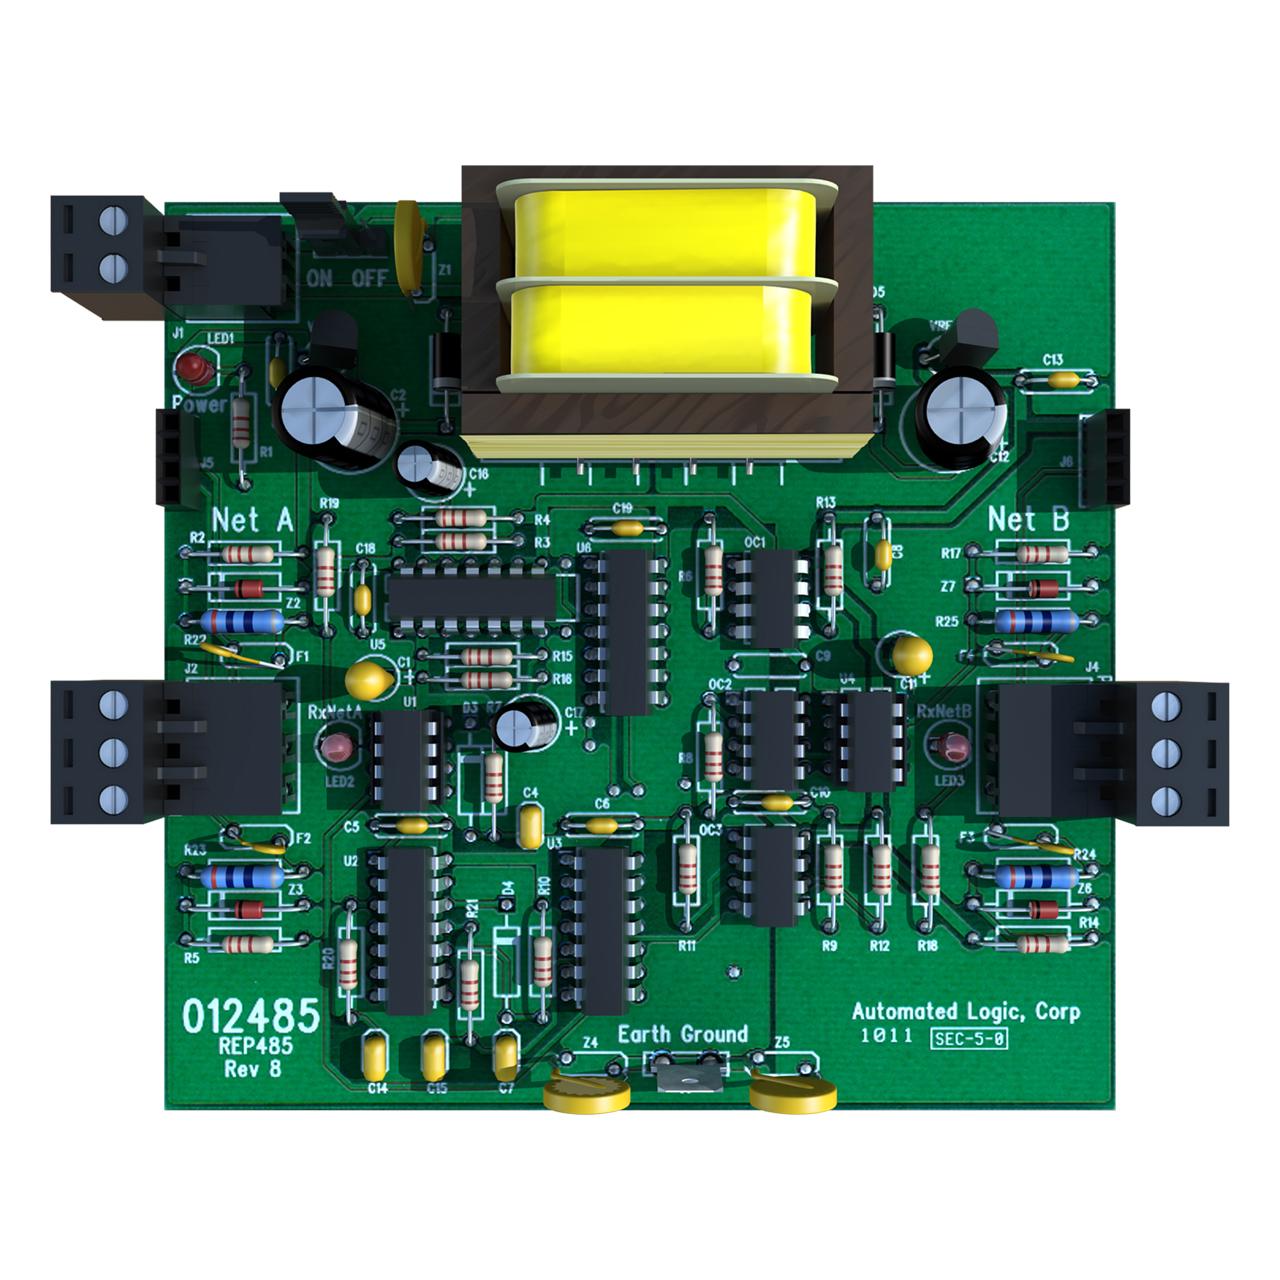 carrier-REP485-ivu-485-repeater